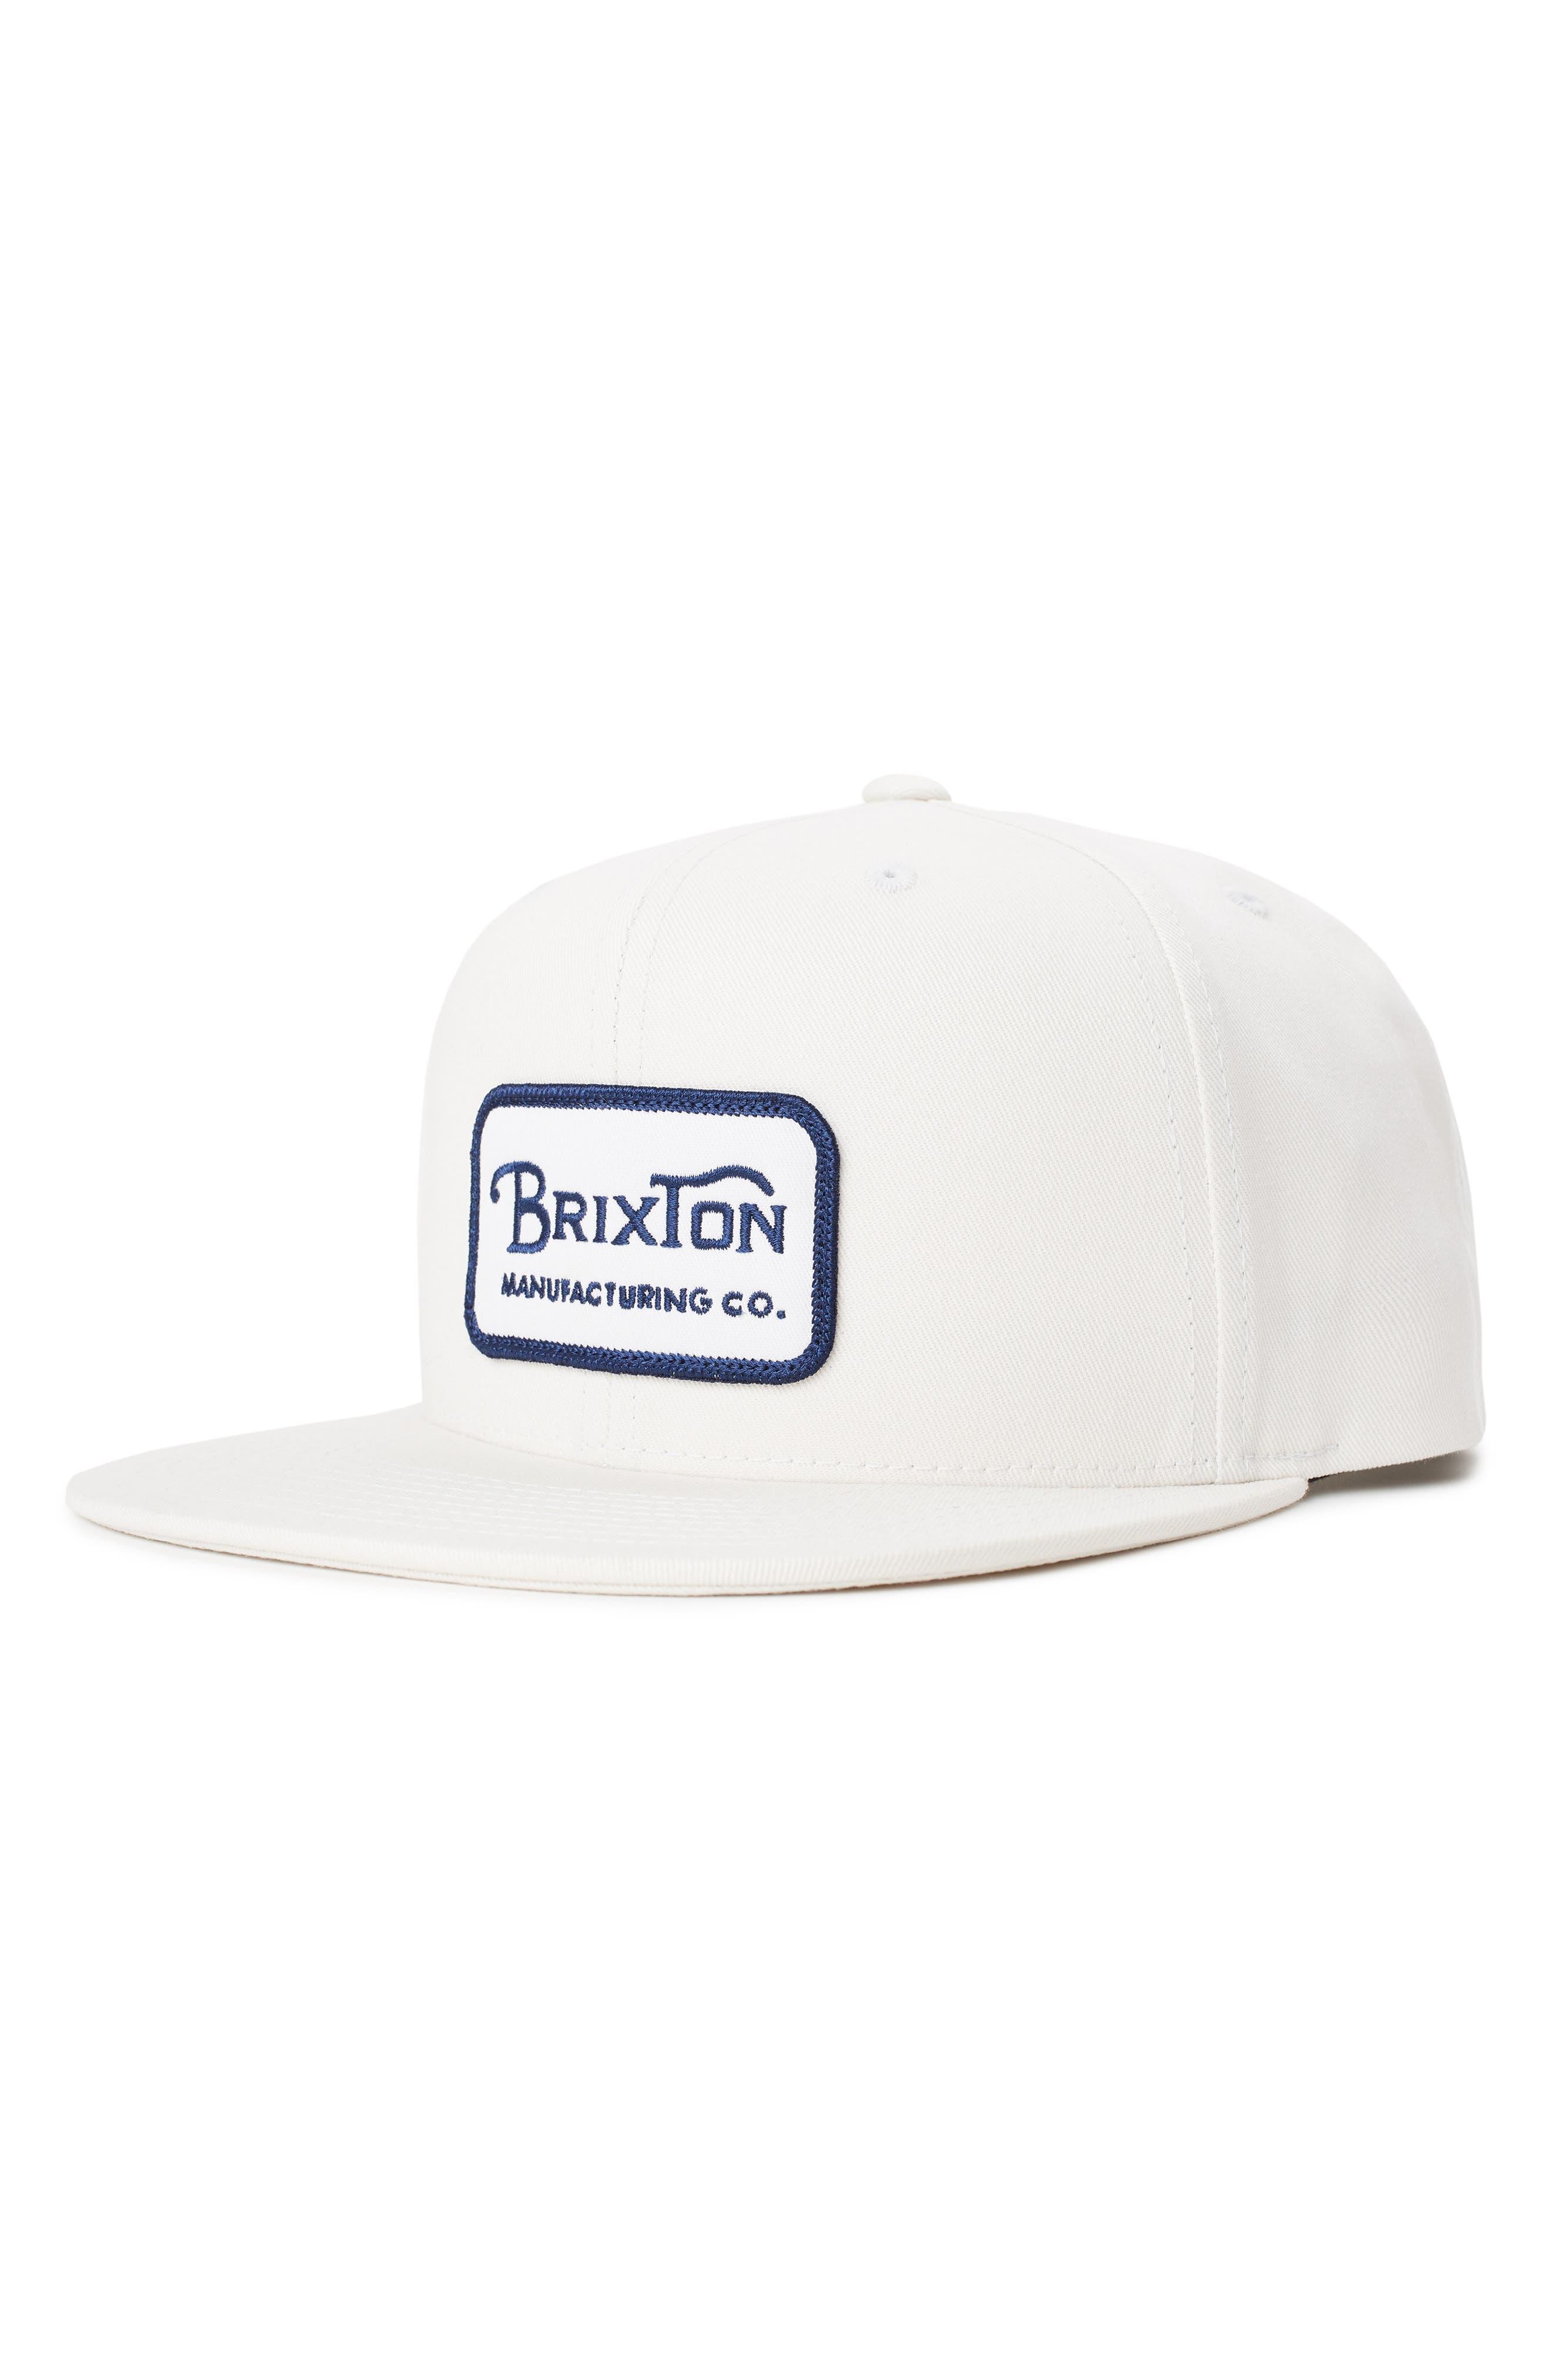 c94cb8fdfcd774 Men's Brixton Hats, Hats for Men   Nordstrom